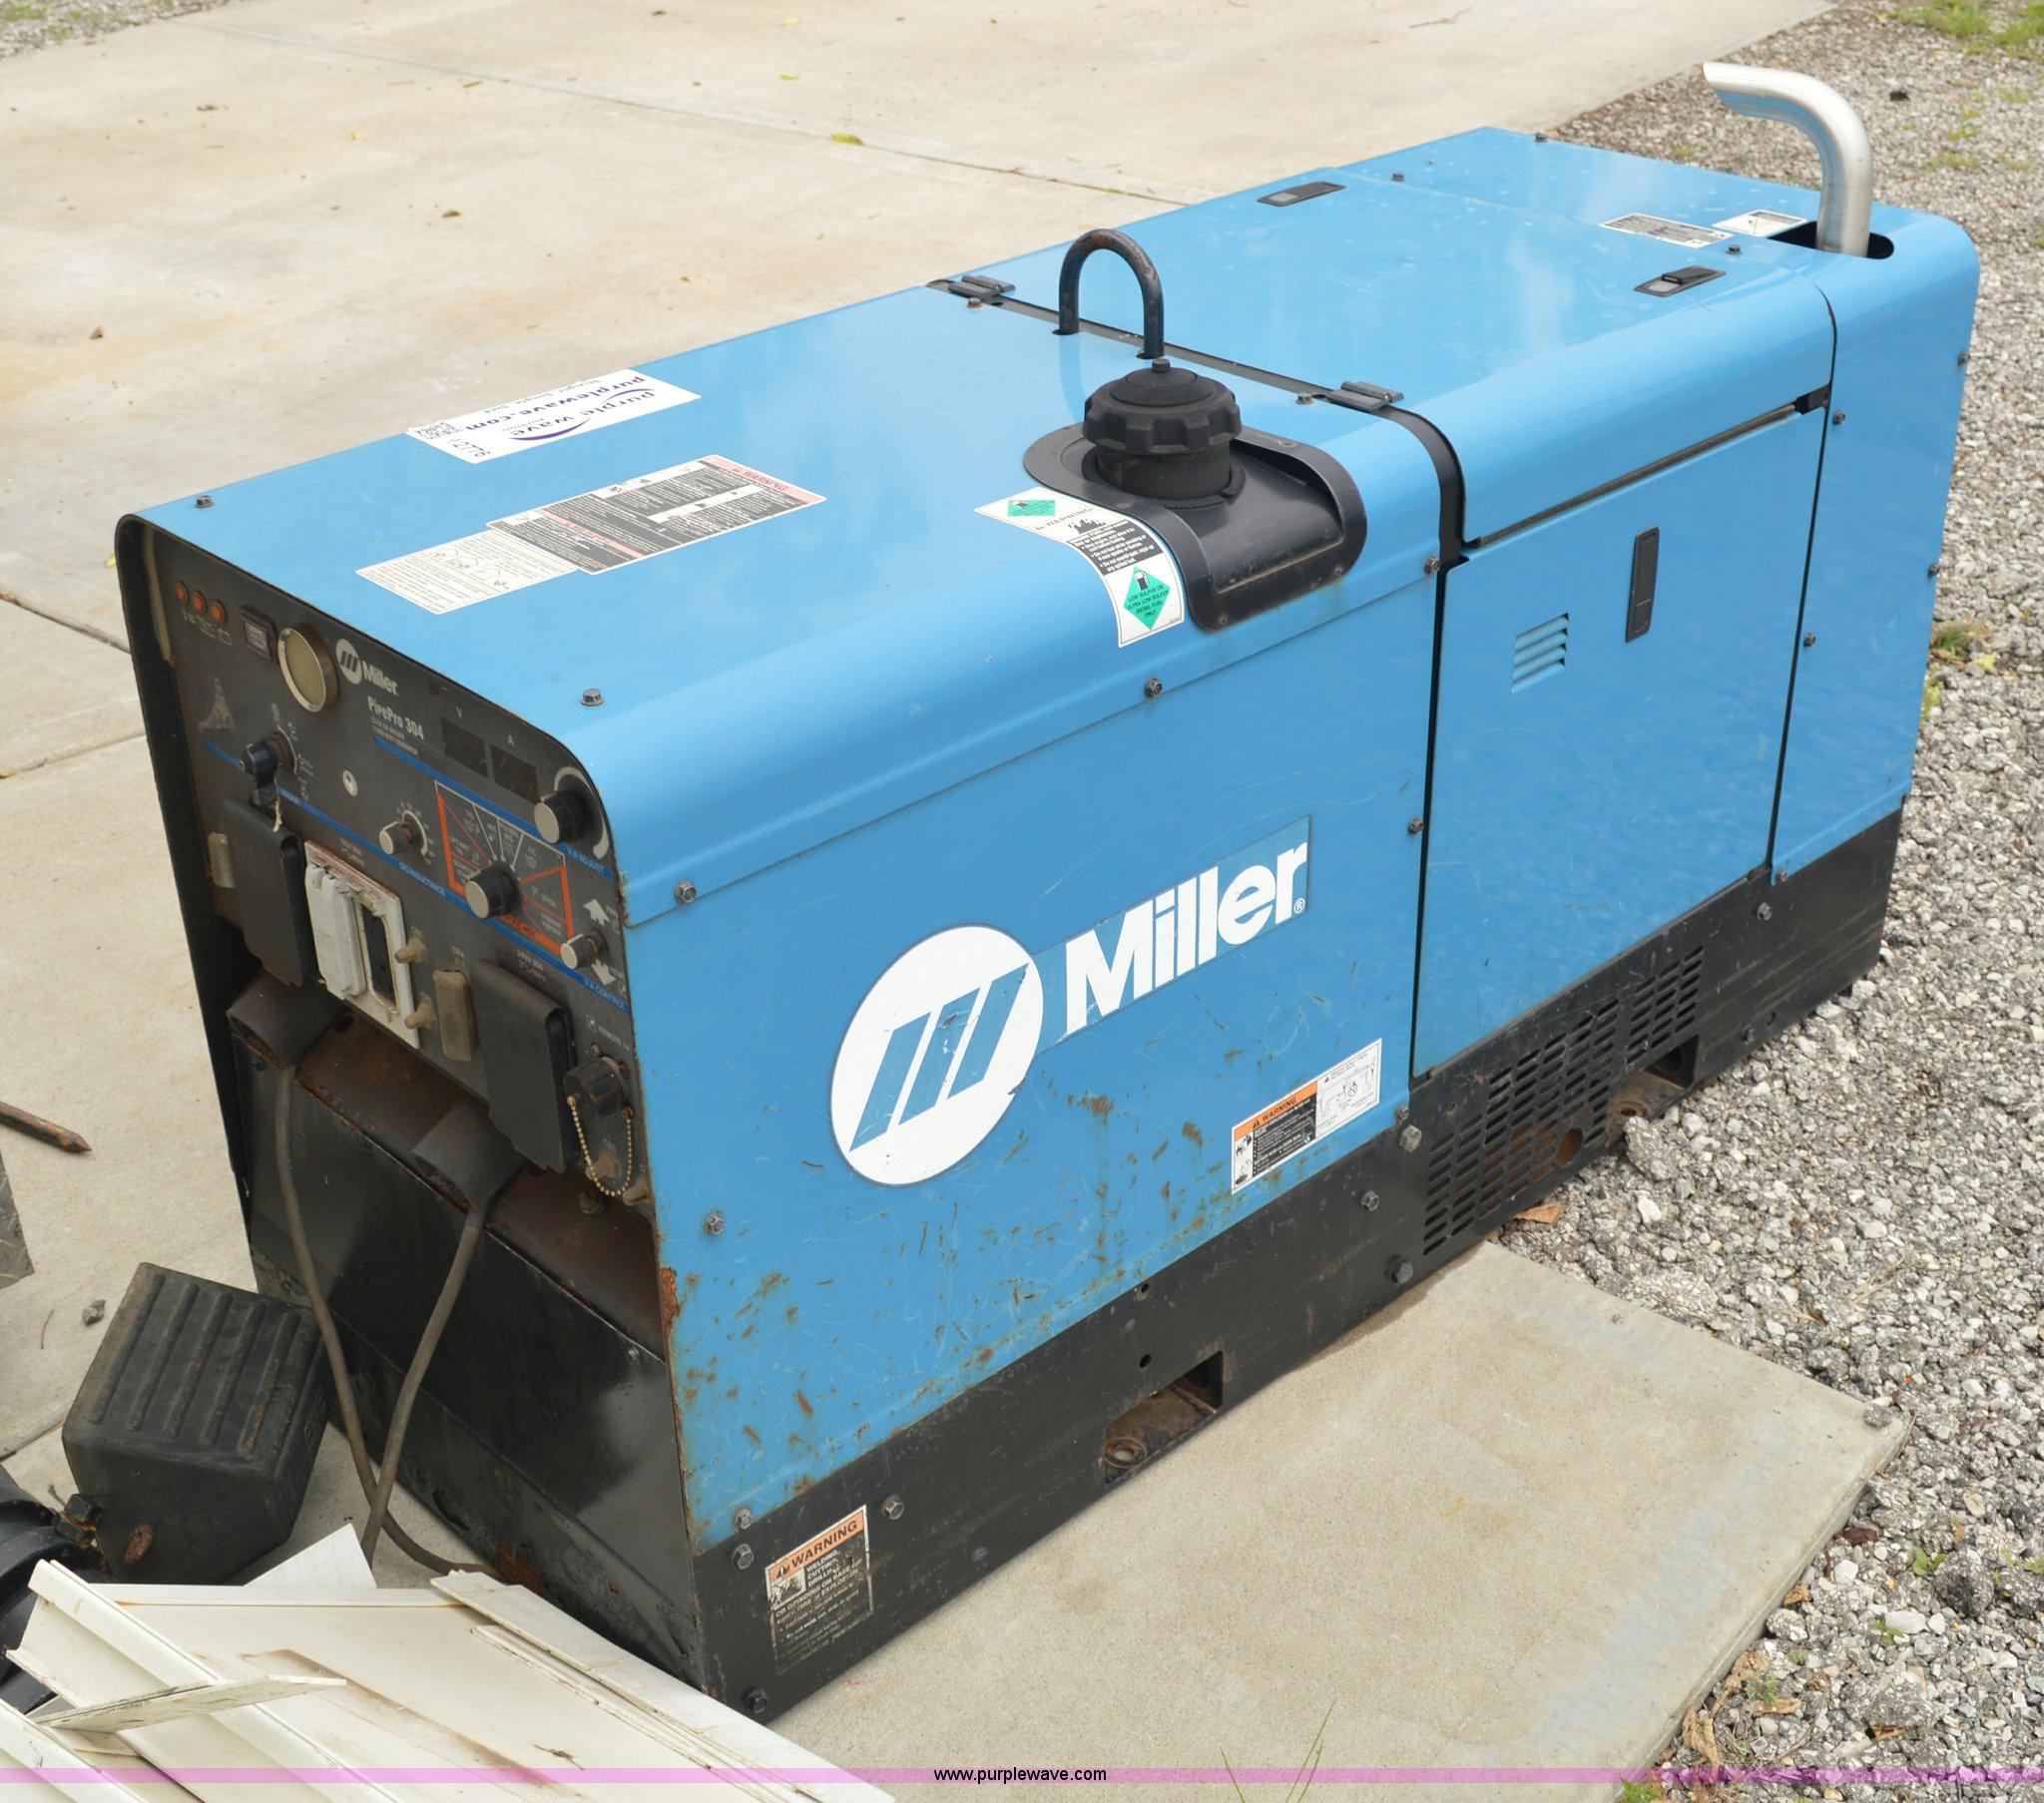 Miller Pipeline Welding Trucks Wiring Diagrams Green Usb Switch Circuit Diagram Projects Nonstopfree Pipe Pro 304 Welder Generator Item I2776 Sold Au Rh Purplewave Com Custom